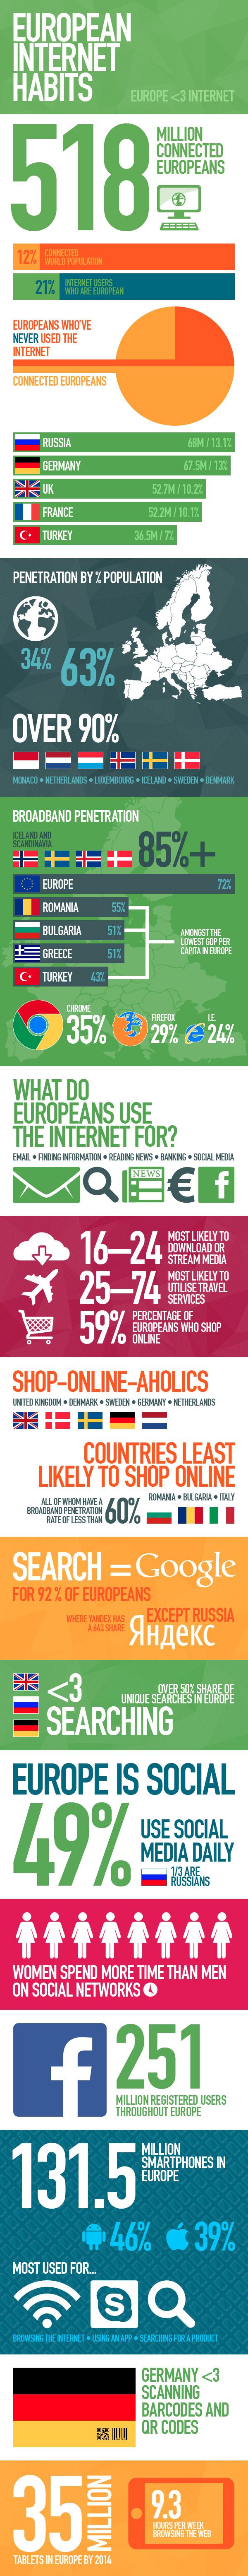 [Infographic] Internetgebruik